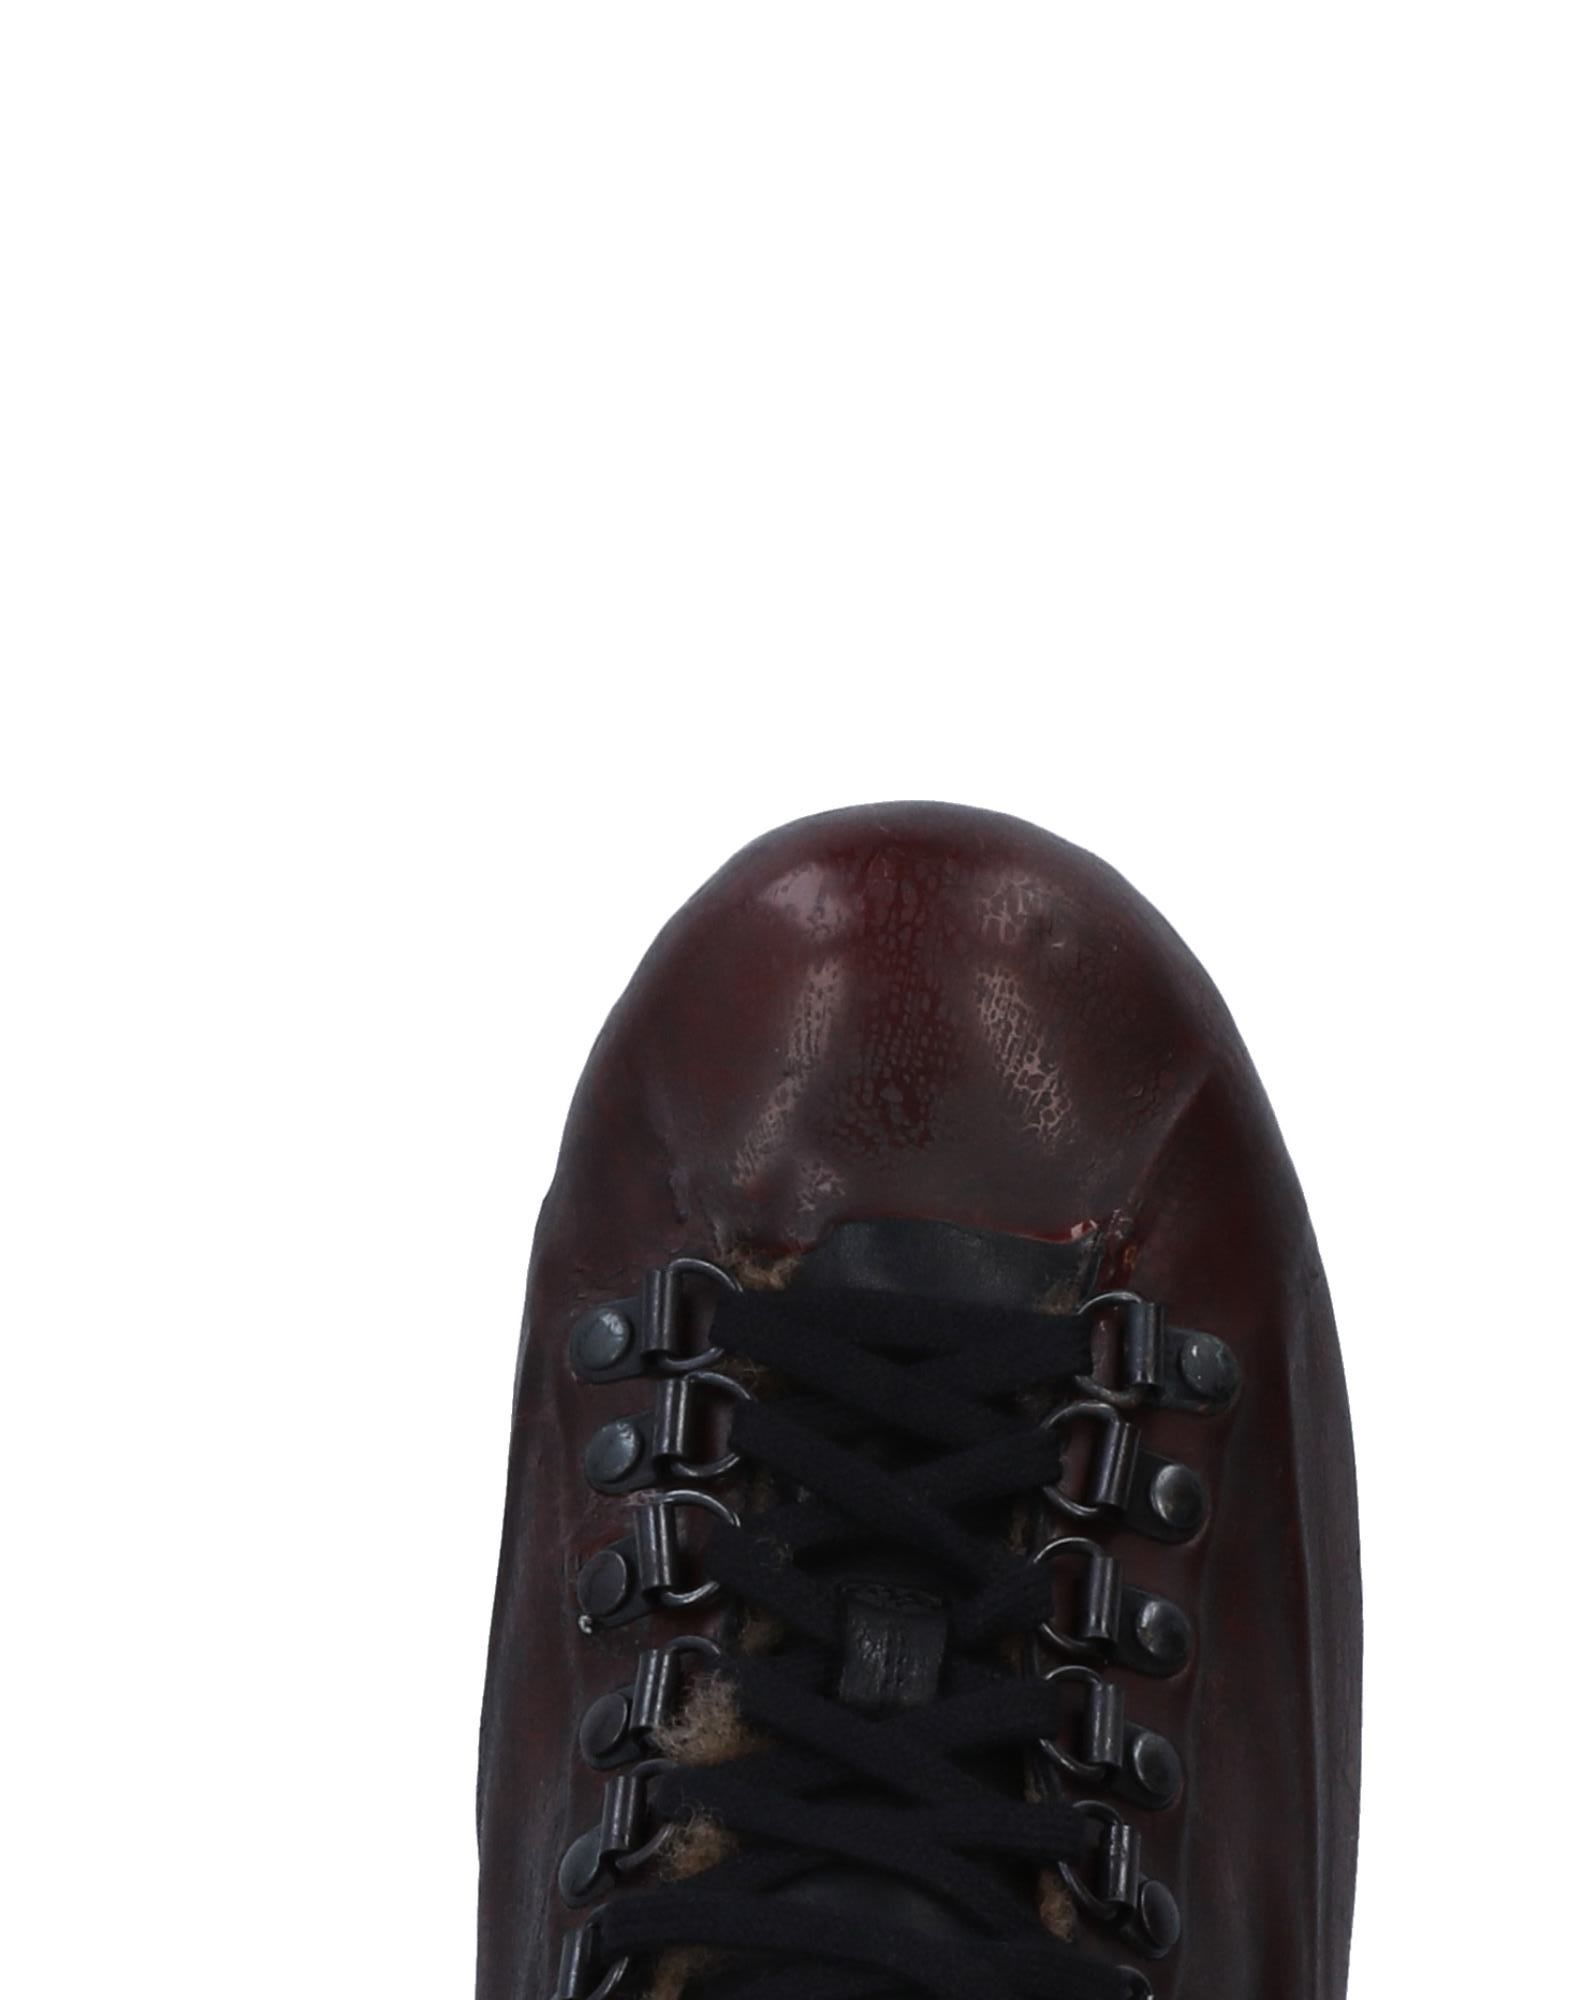 Stilvolle billige Schuhe Damen O.X.S. Rubber Soul Sneakers Damen Schuhe  11457538WP e0c20a